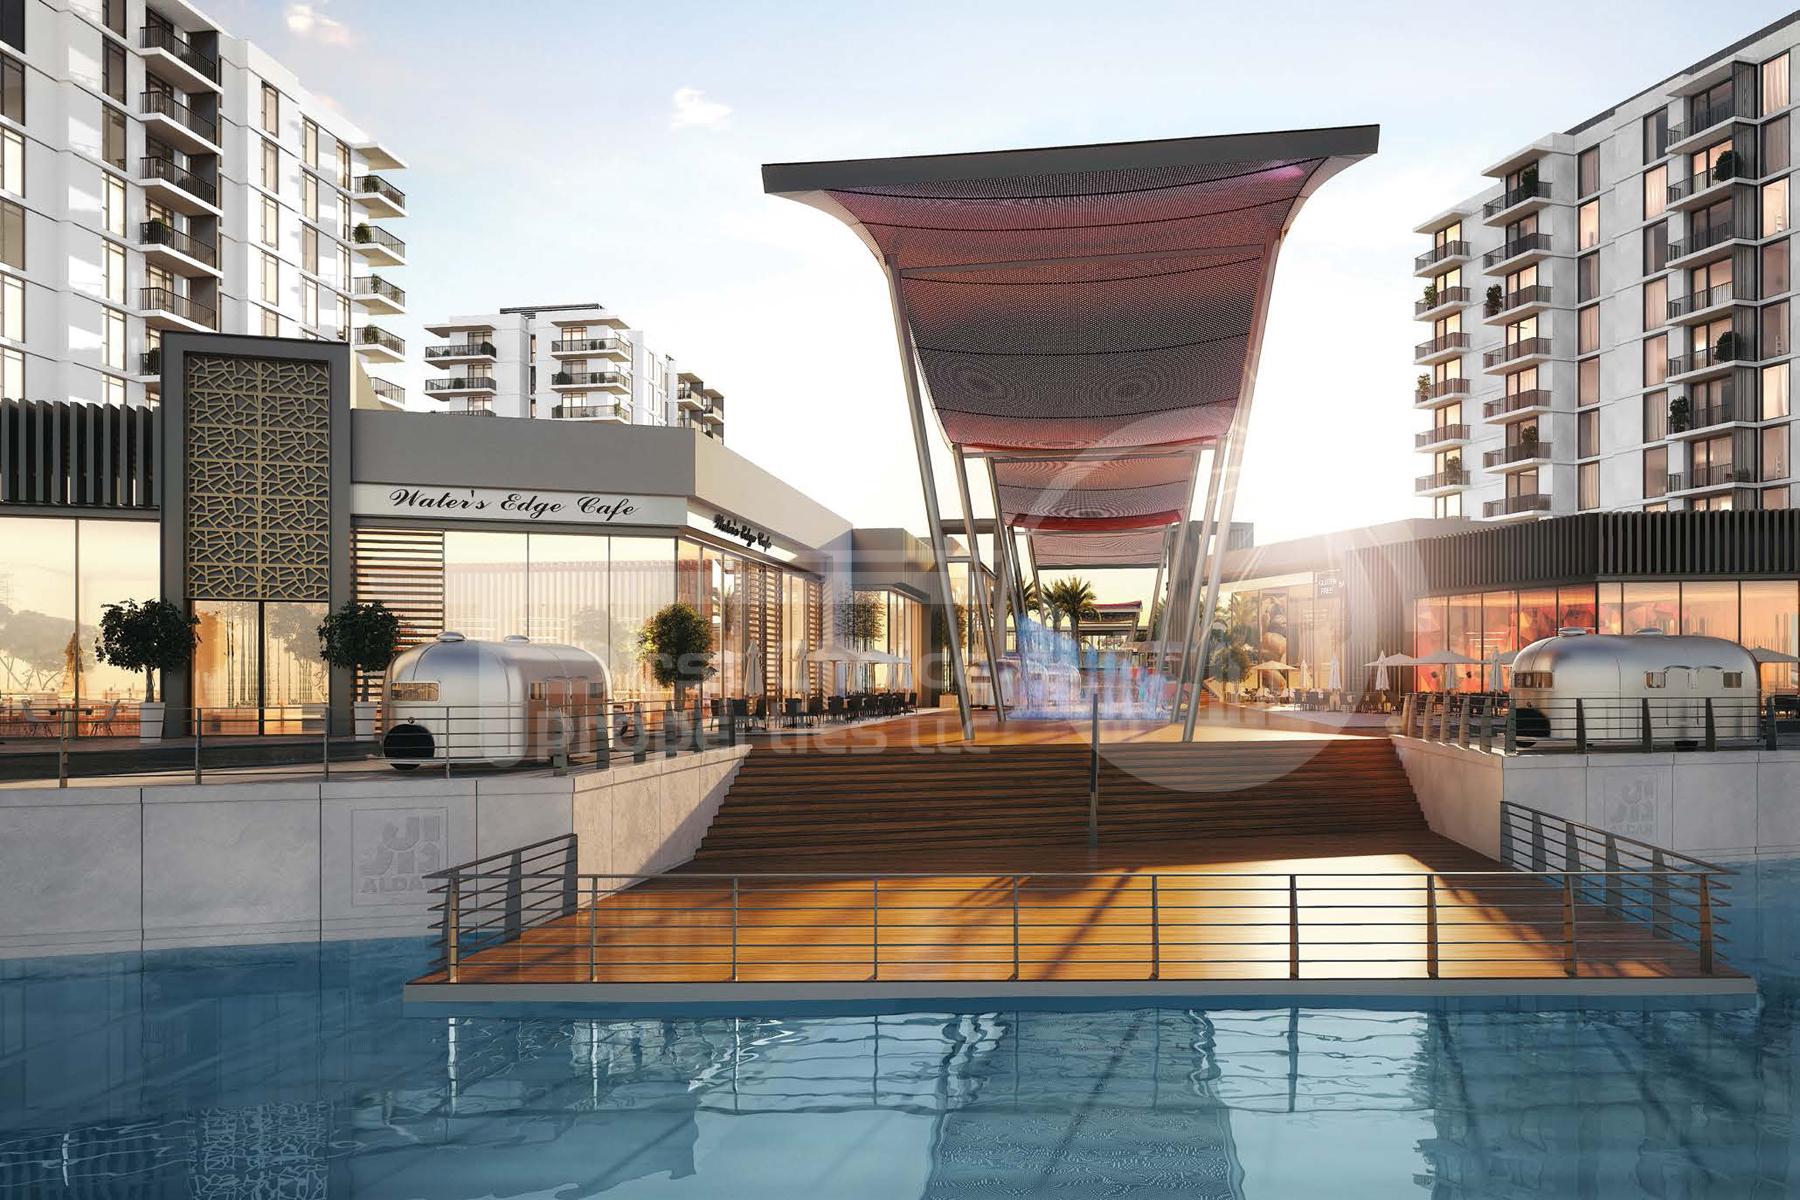 Studio - 1 Bedroom - 2 Bedroom - 3 Bedroom Apartment - Water's Edge - Yas Island - Abu Dhabi - UAE (13).jpg